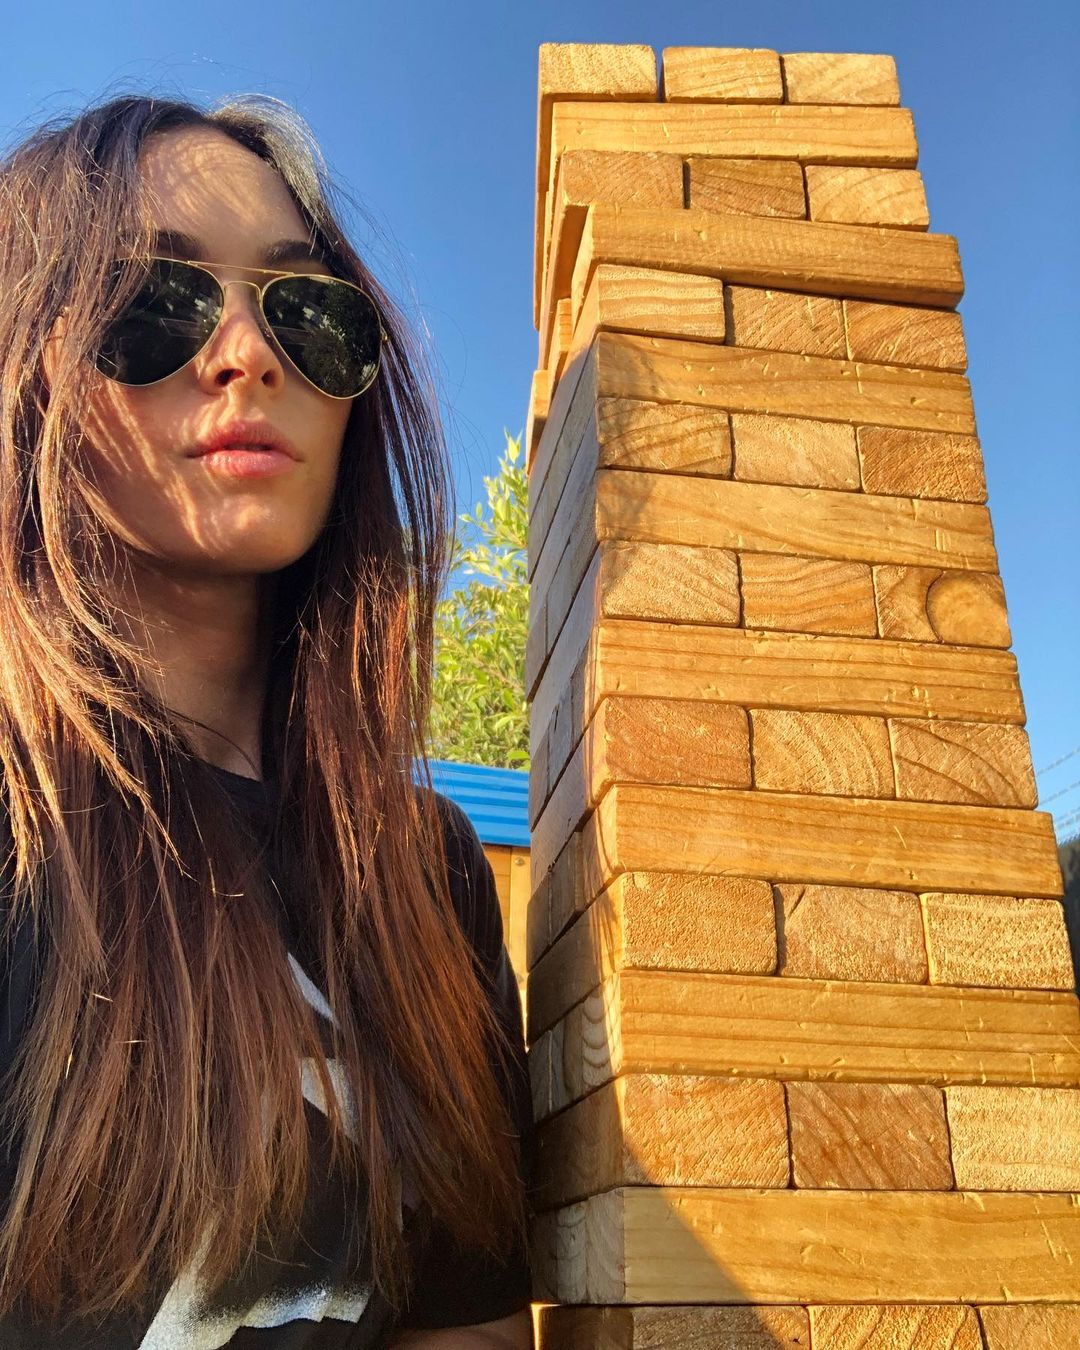 Megan-Fox-Wallpapers-Insta-Fit-Bio-15